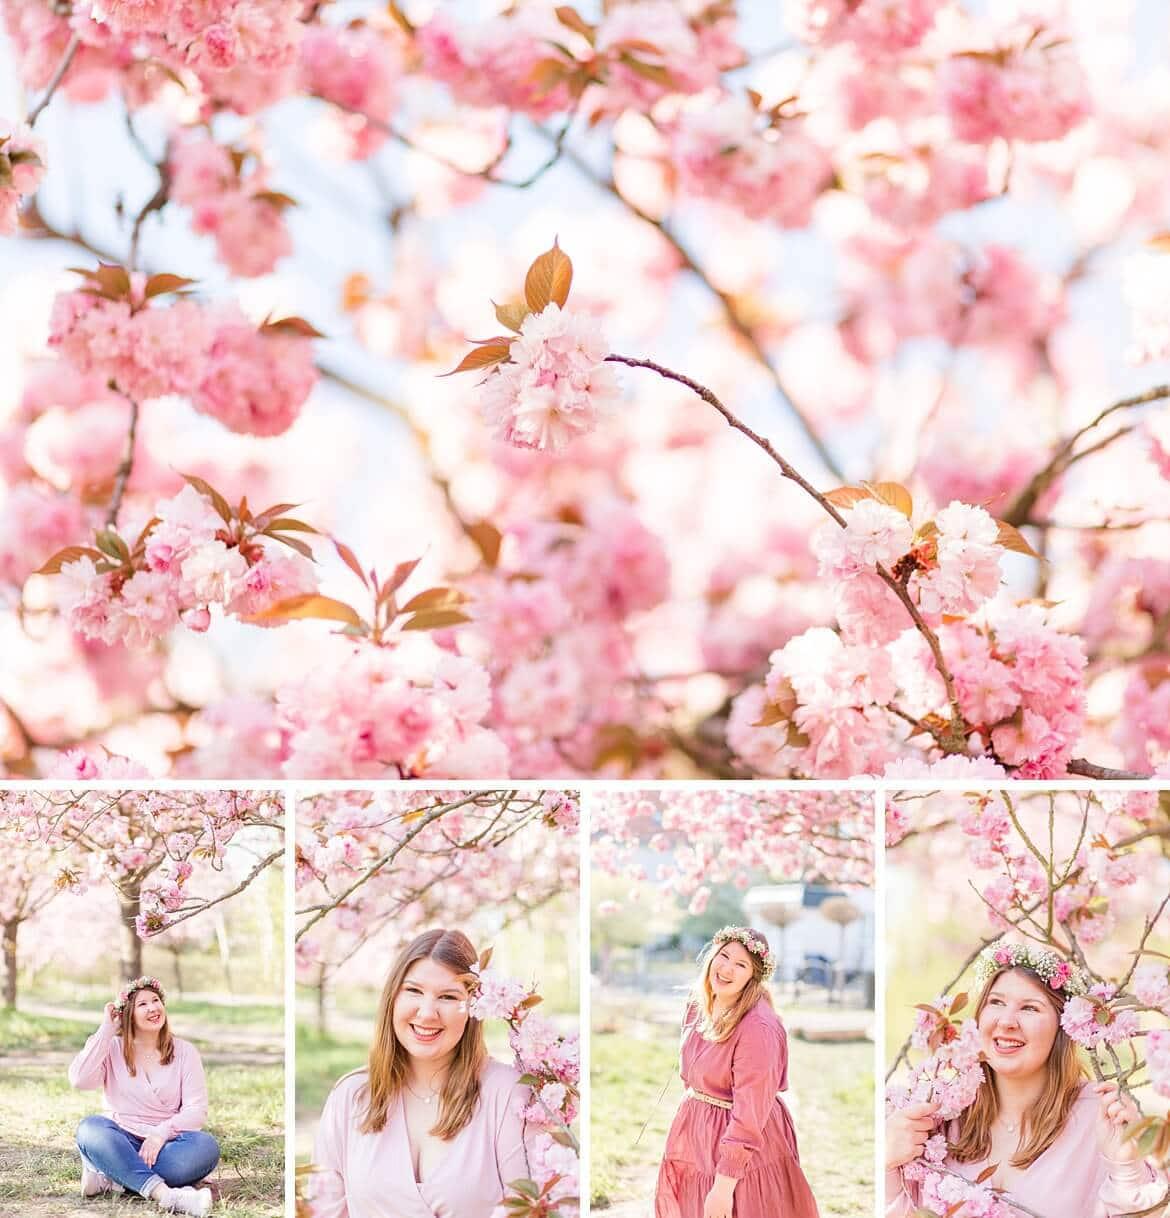 Lara Kirschblüten Portraits